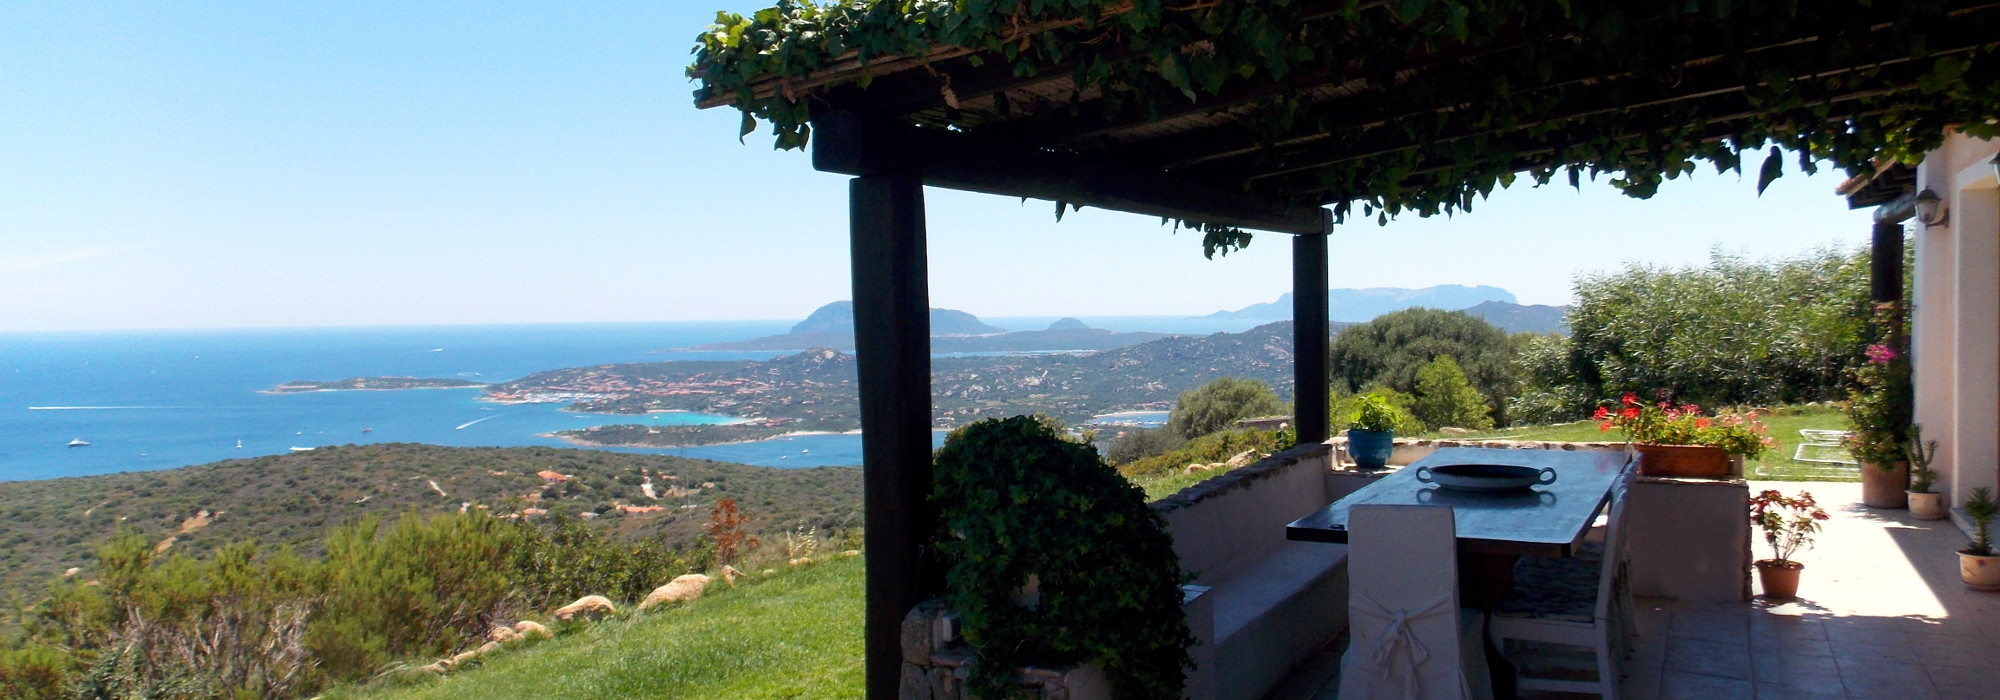 Costa Smeralda Villa panoramica